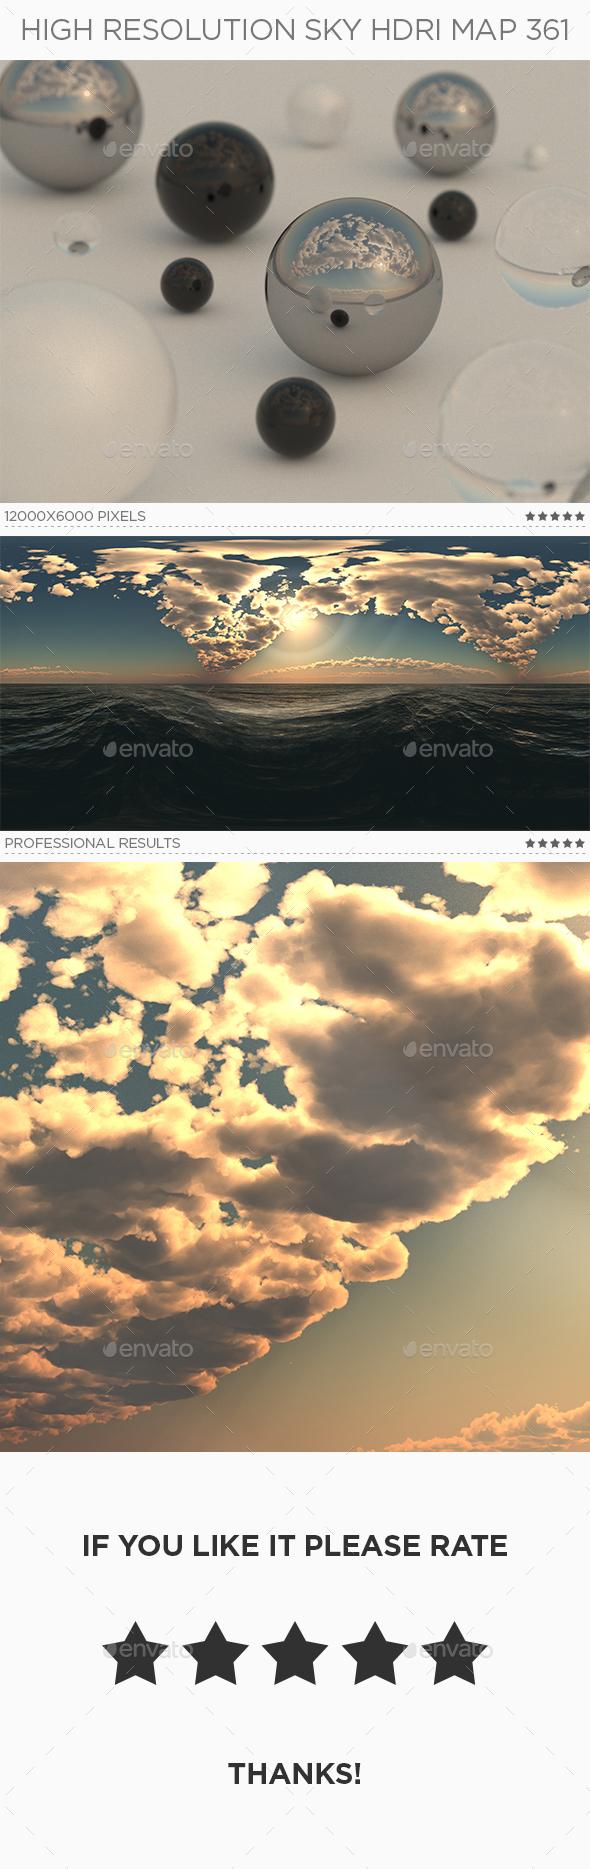 High Resolution Sky HDRi Map 361 - 3DOcean Item for Sale